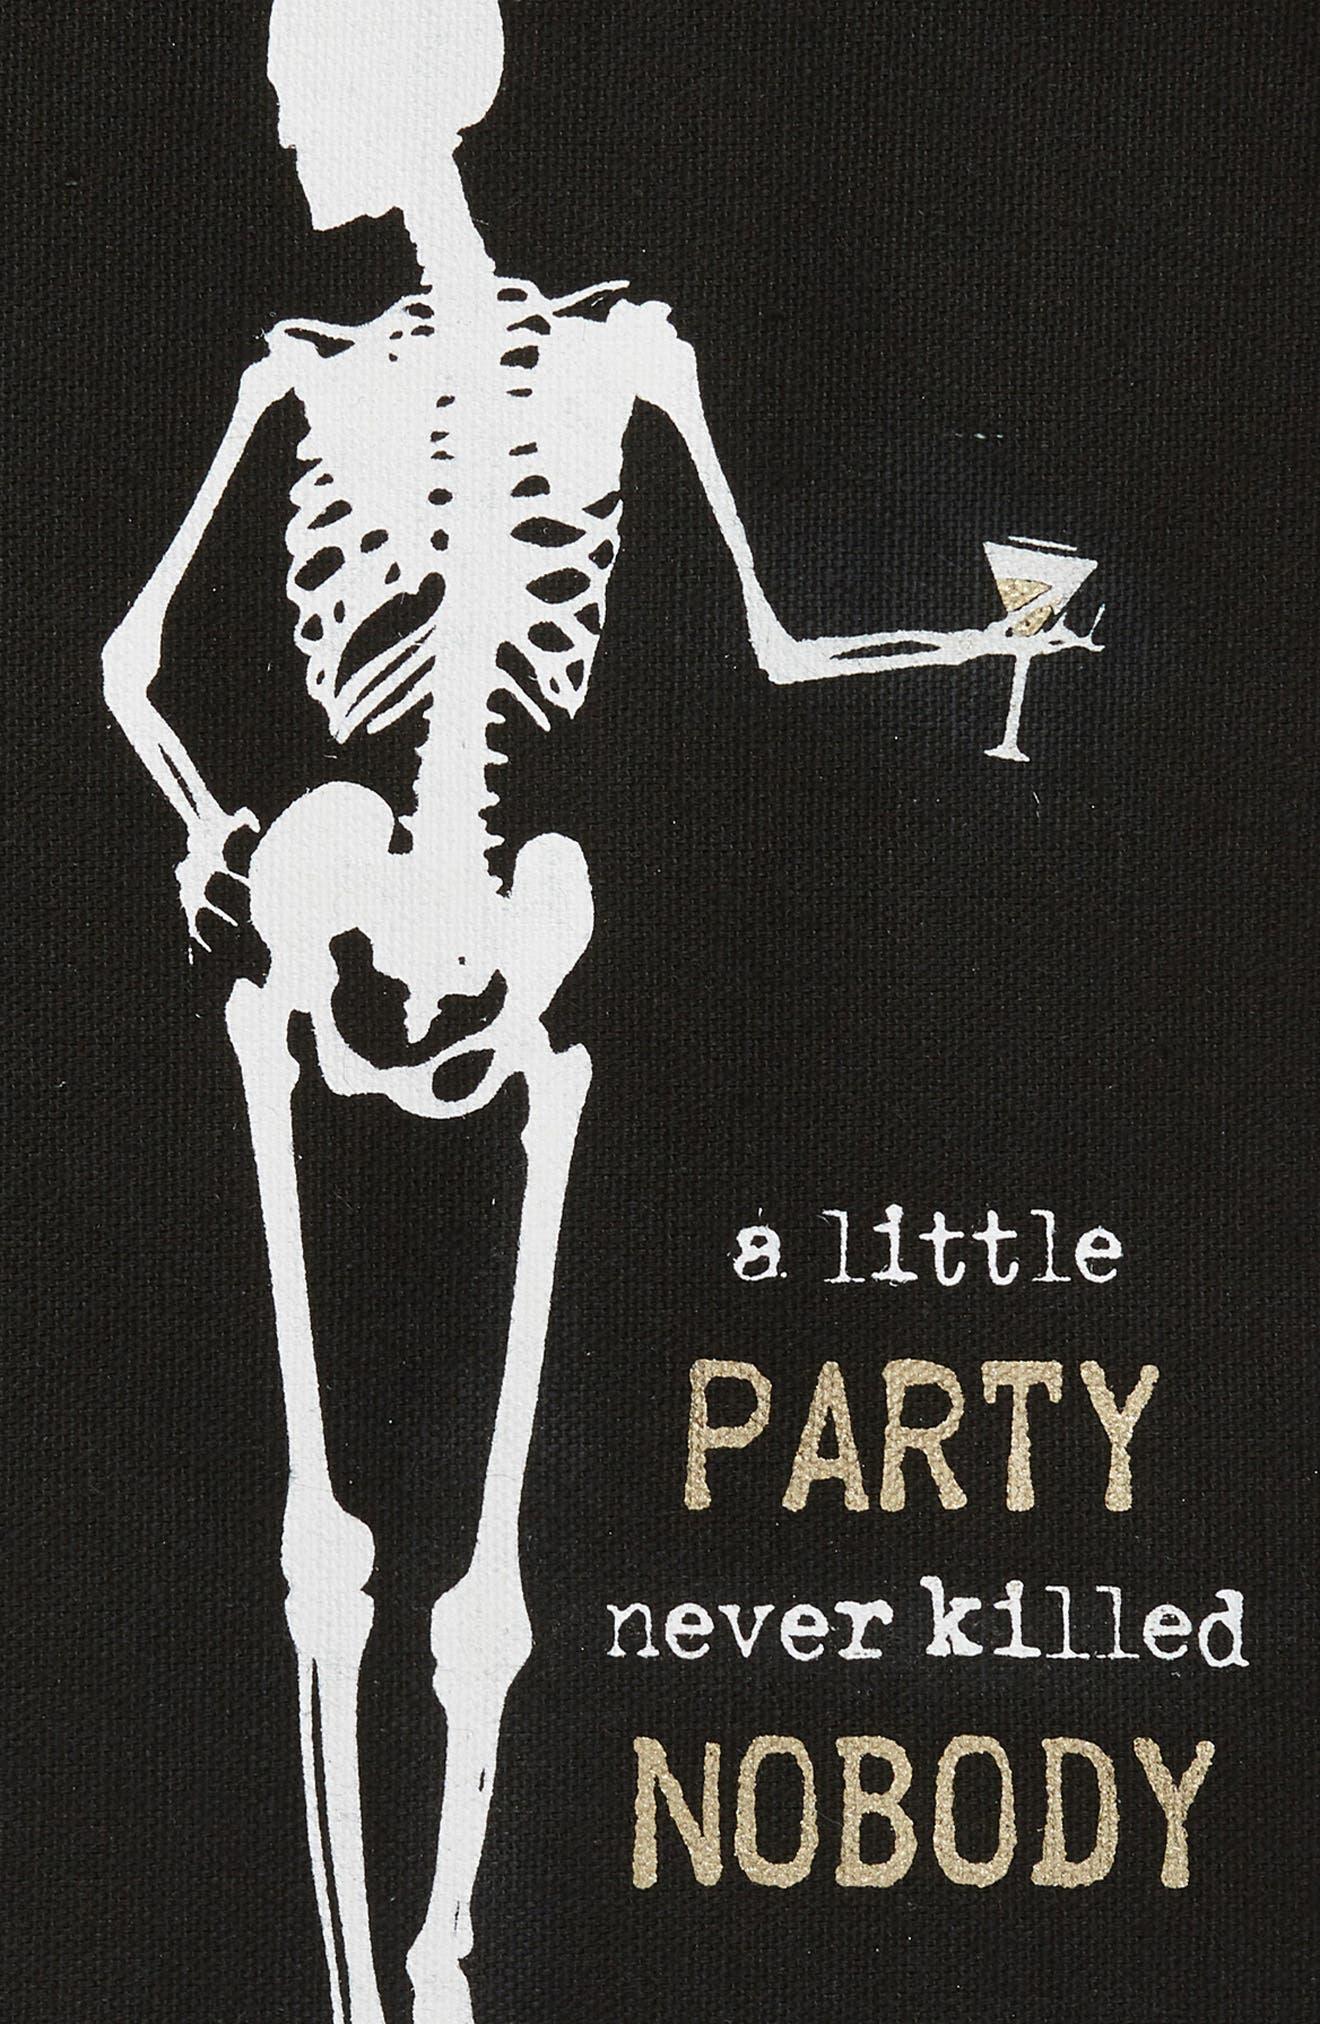 A Little Party Never Killed Nobody Set of 2 Dishtowels,                             Alternate thumbnail 2, color,                             001